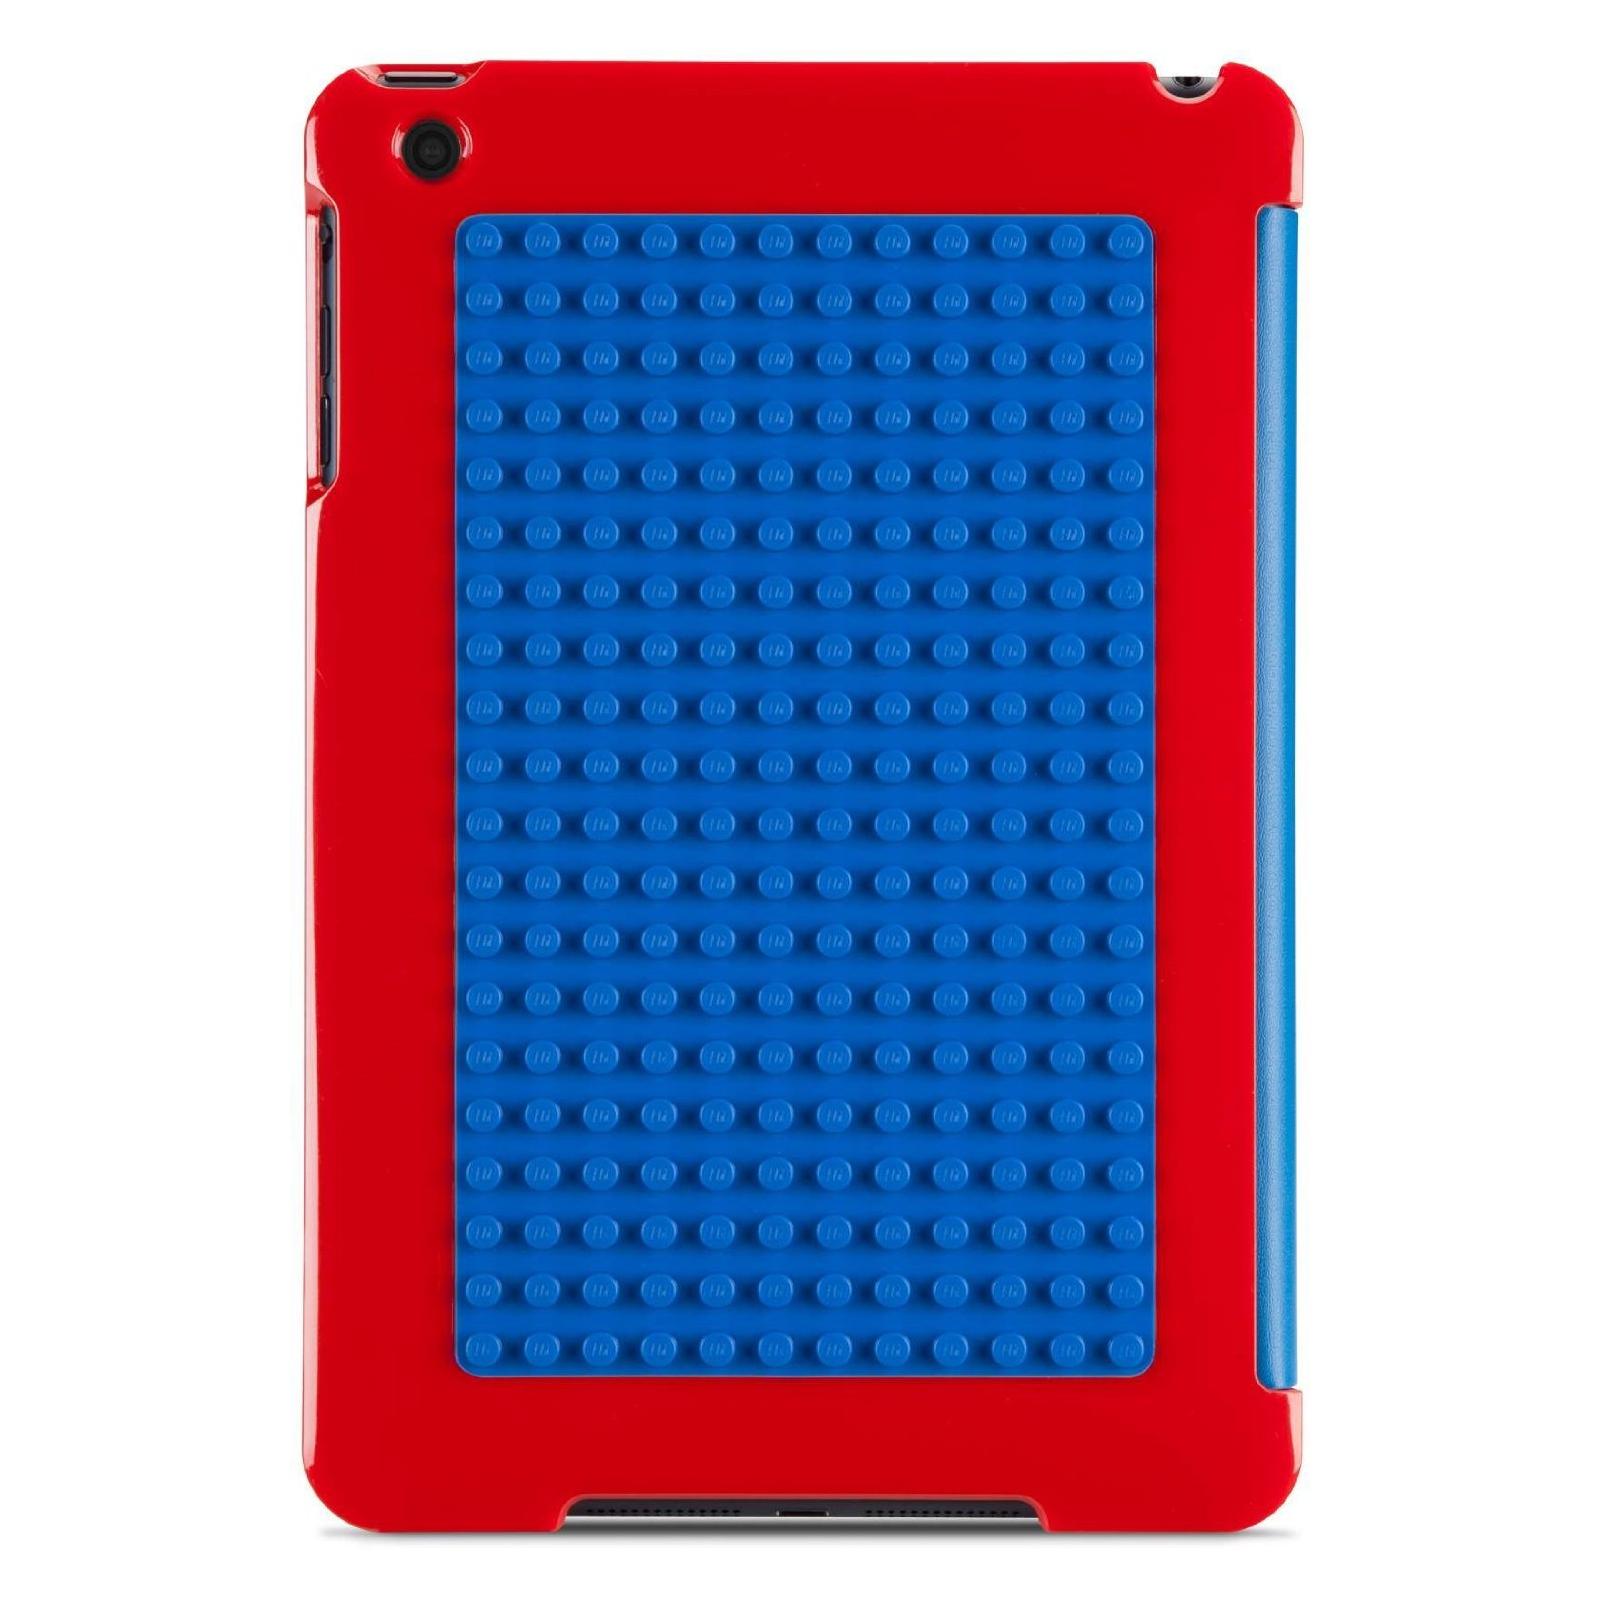 Чехол для планшета Belkin iPad mini LEGO Builder Case Red-Blue (F7N110B2C02)